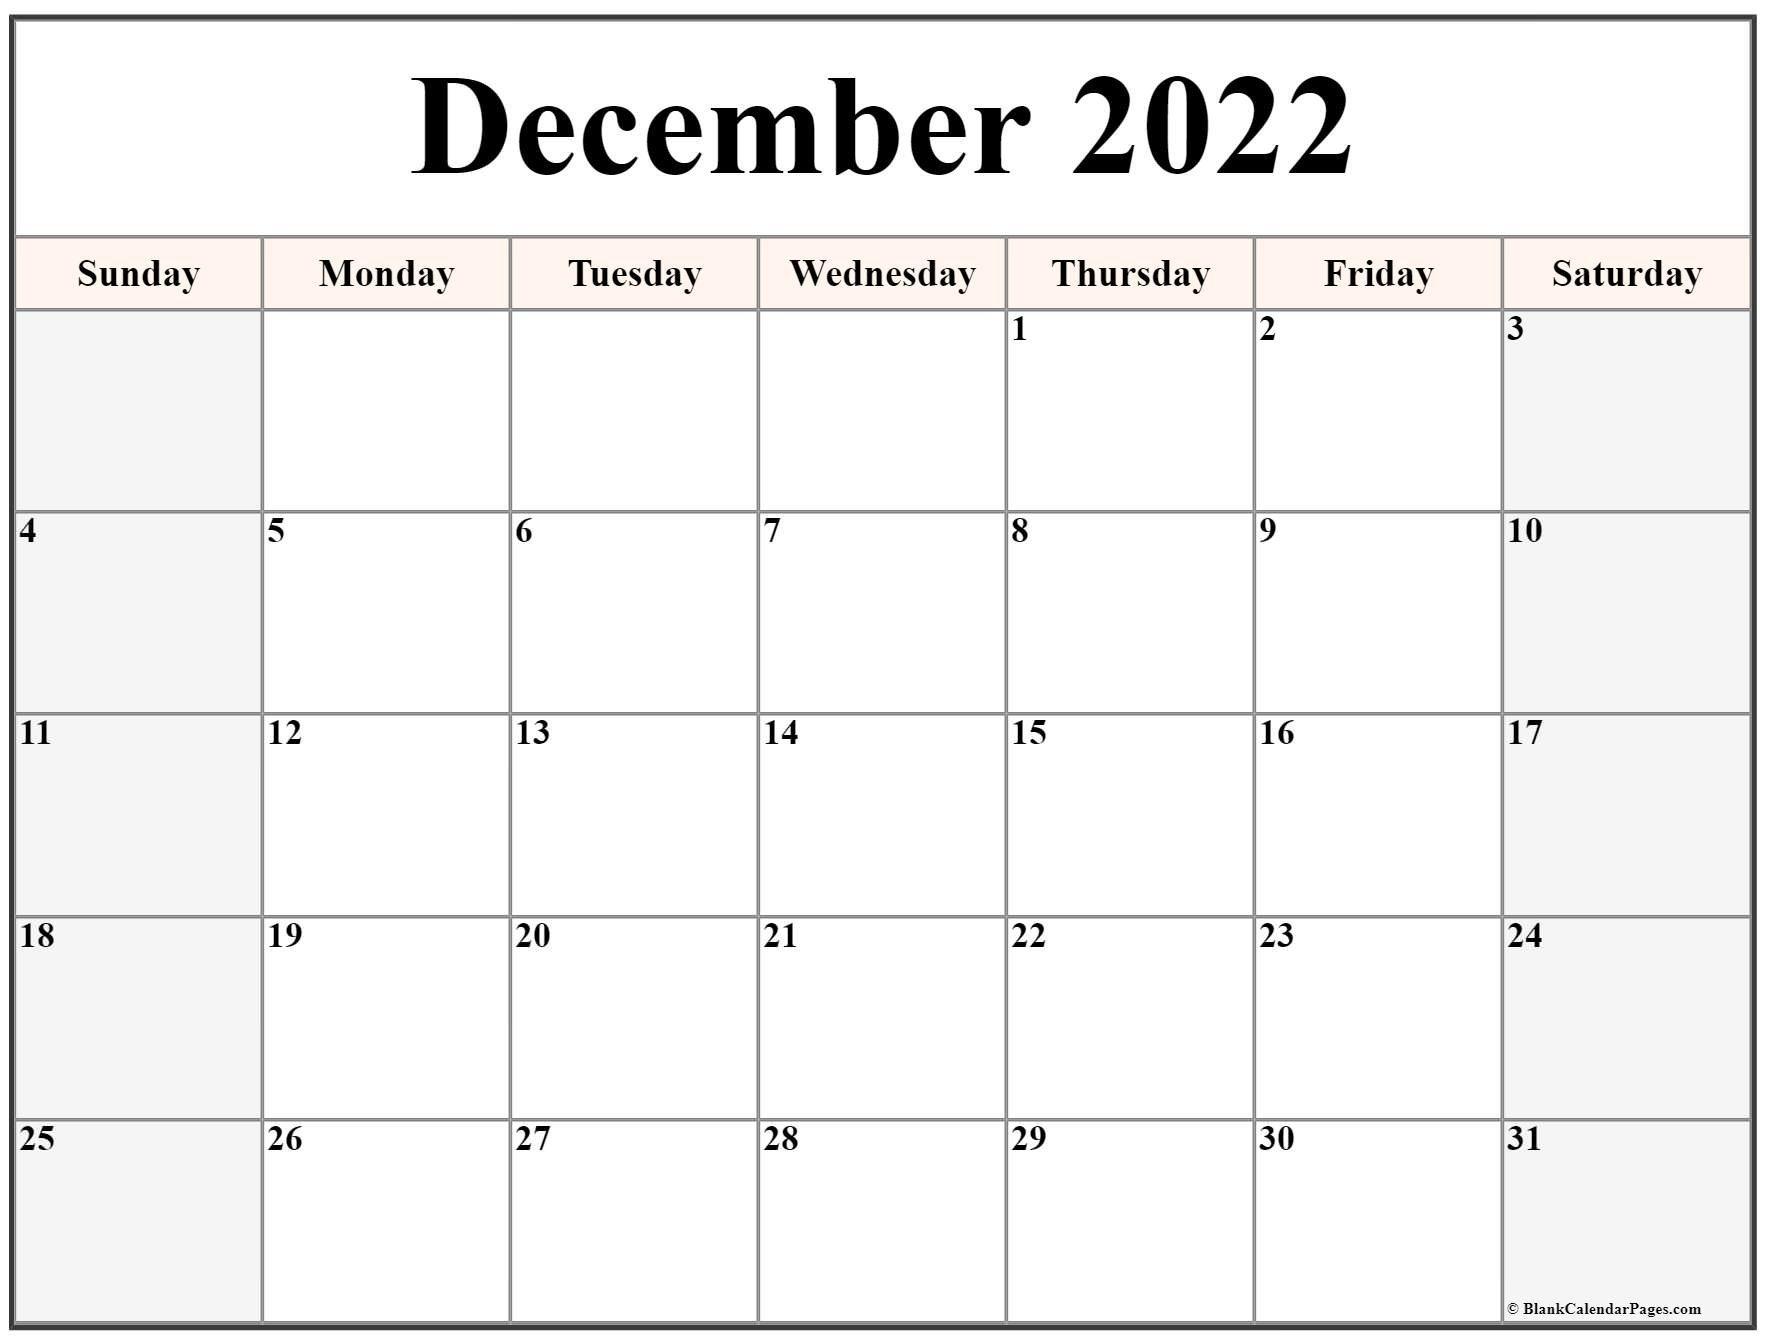 December 2022 Calendar | Free Printable Calendar Templates regarding 2022 April Calendar Free Printable